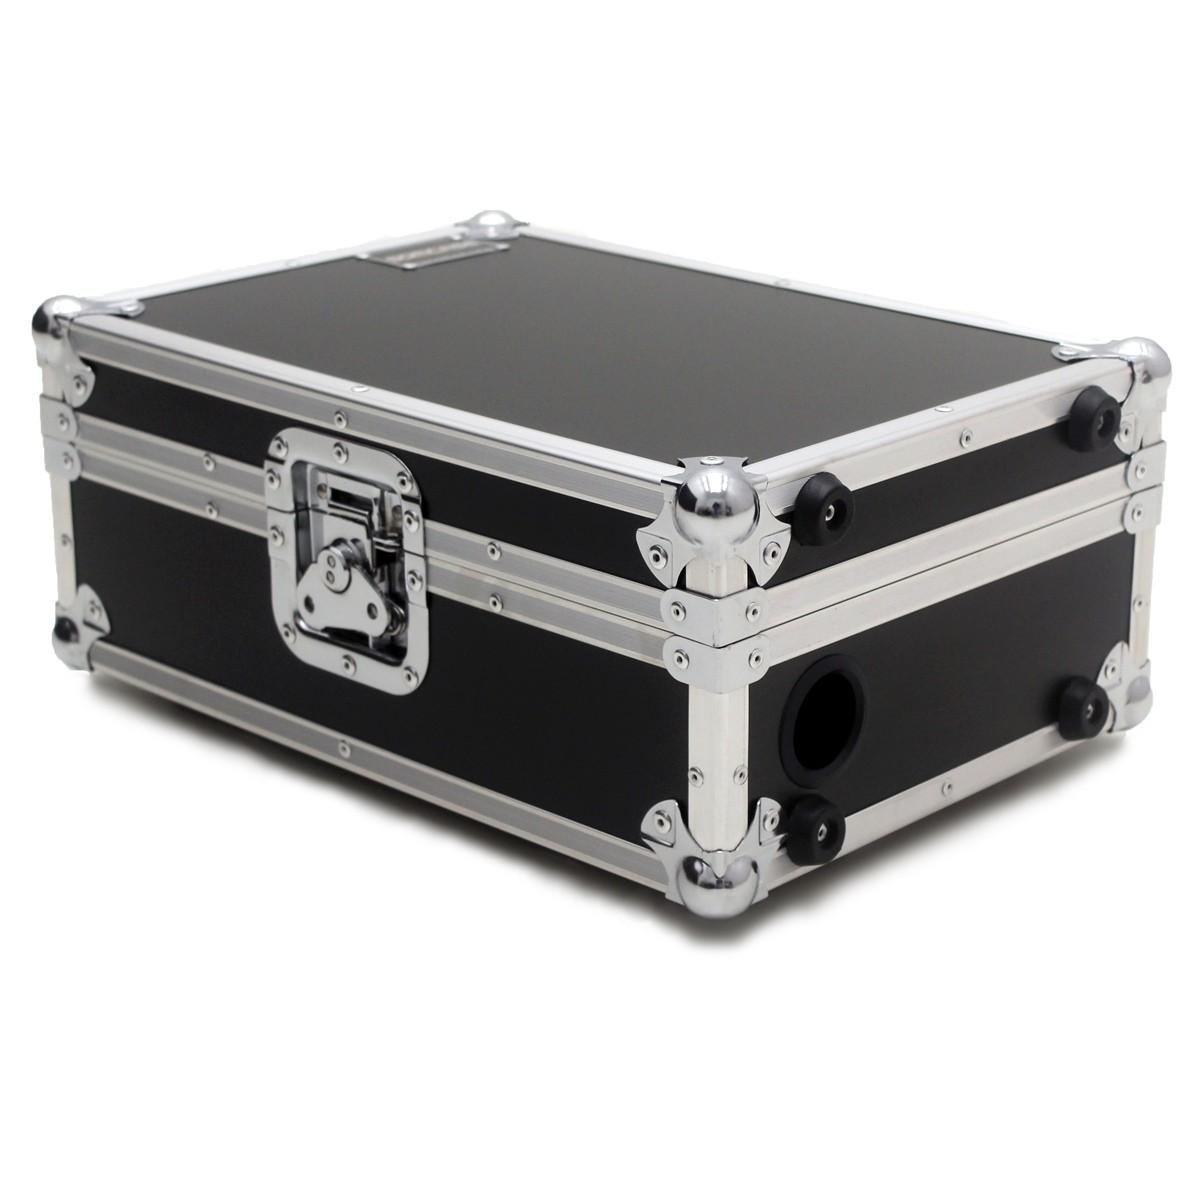 Hard Case Mixer Pioneer DJM 400 - emb6